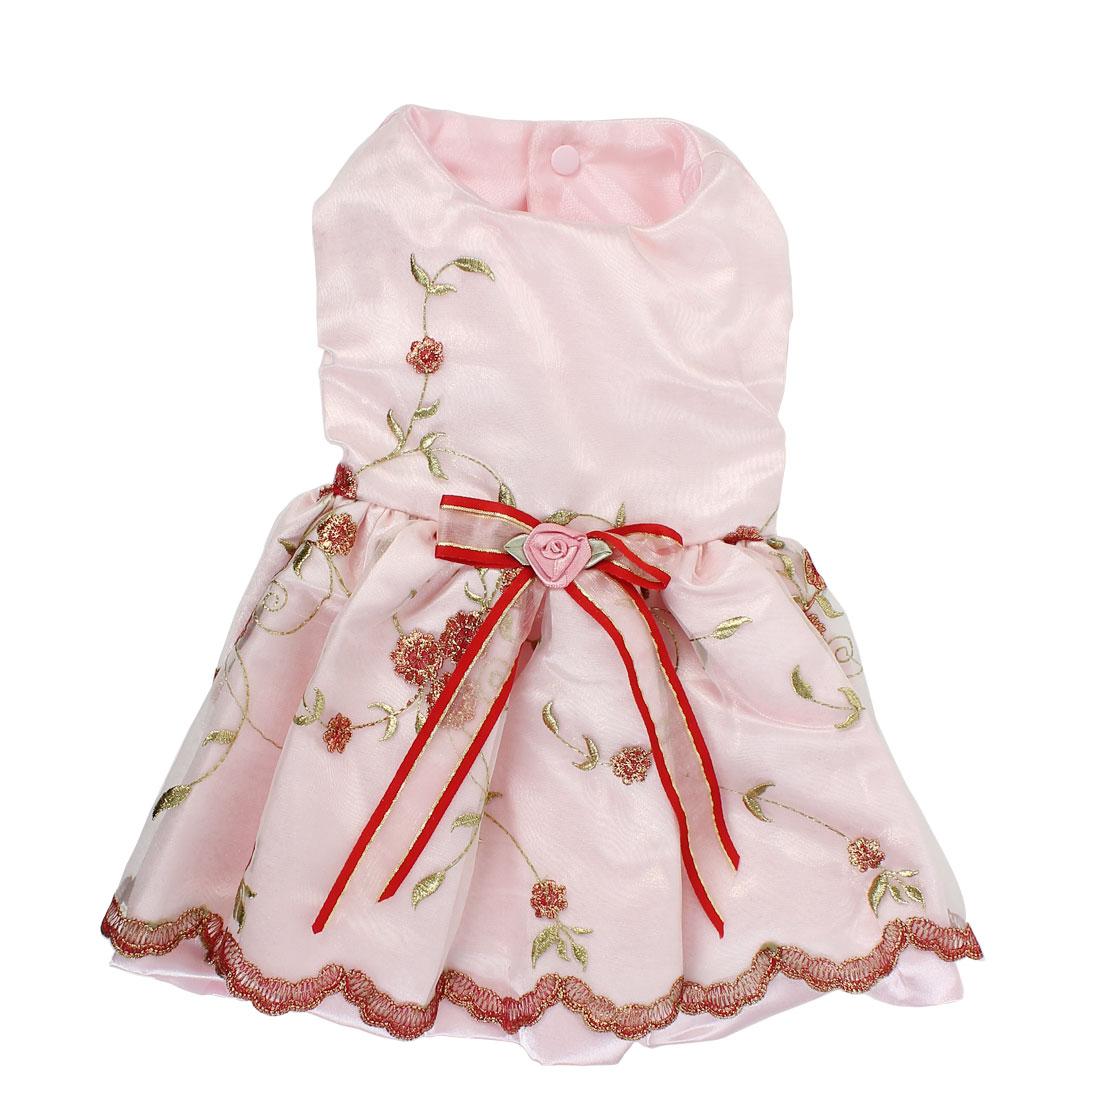 Pet Dog Princess Wedding Dress Rosettes Bowknots Design Skirt Pink Size L